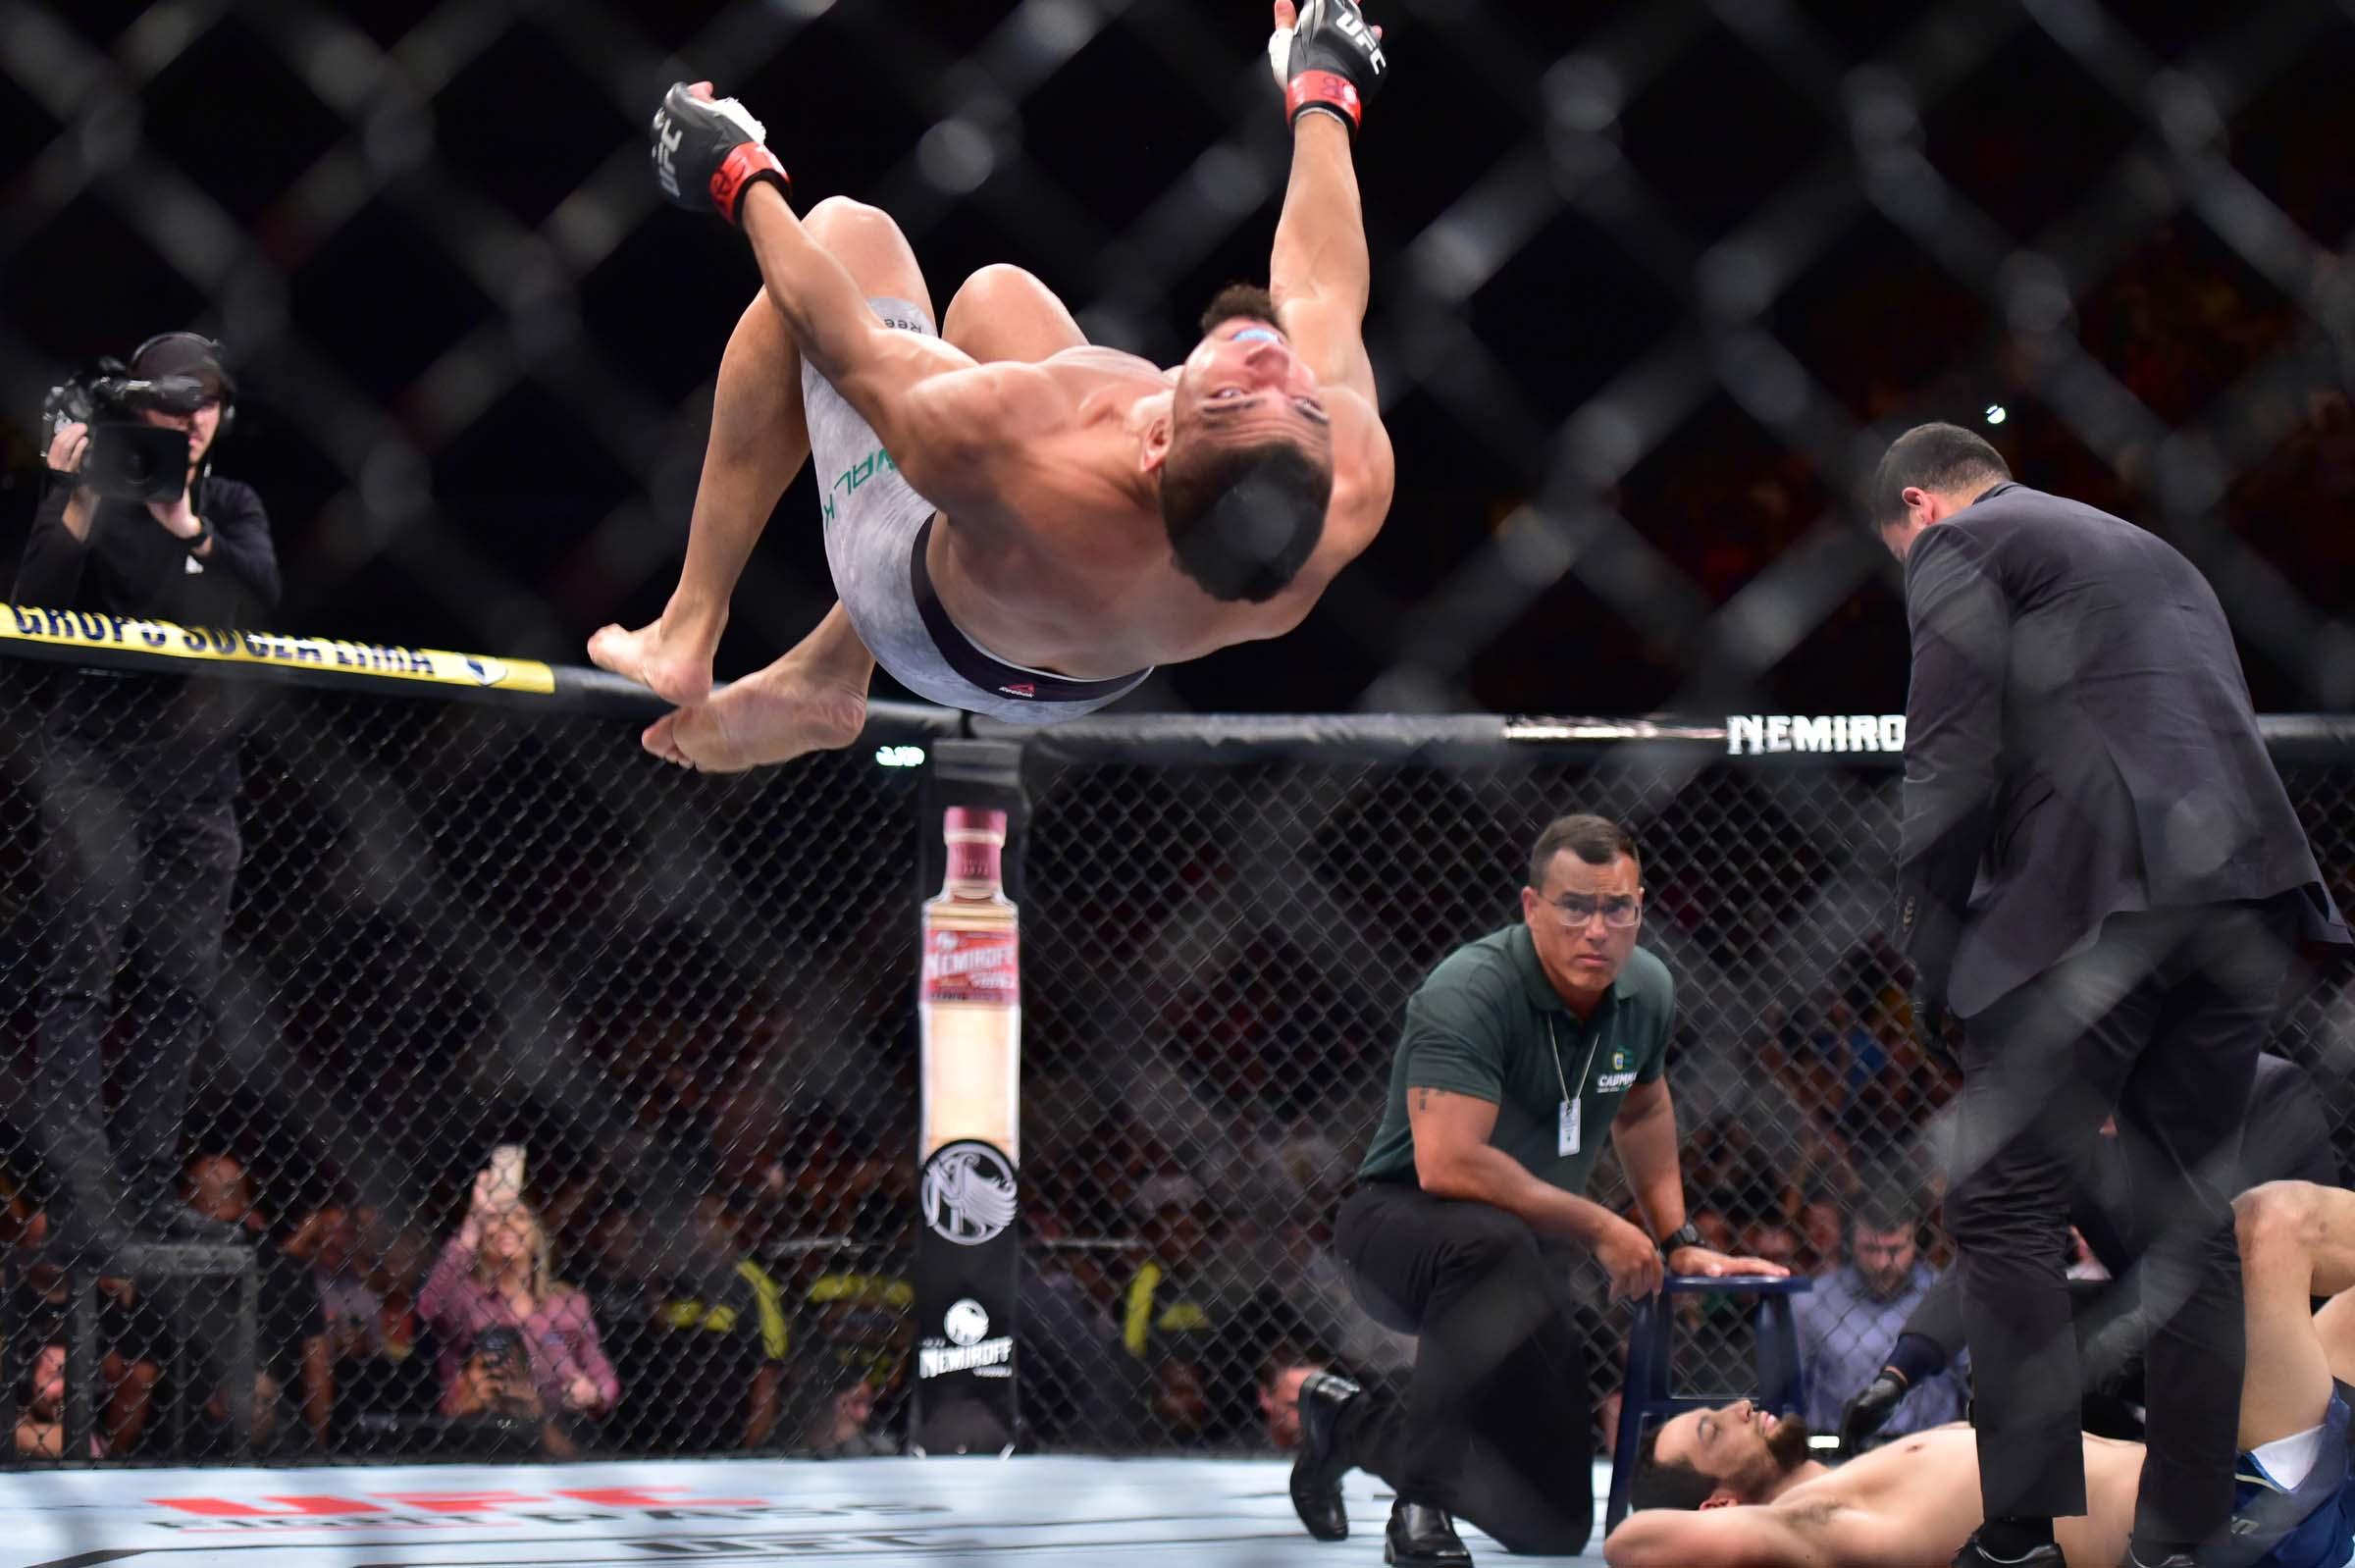 Johnny Walker (red gloves) reacts to fight against Justin Ledet (blue gloves) during UFC Fight Night at Arena CFO